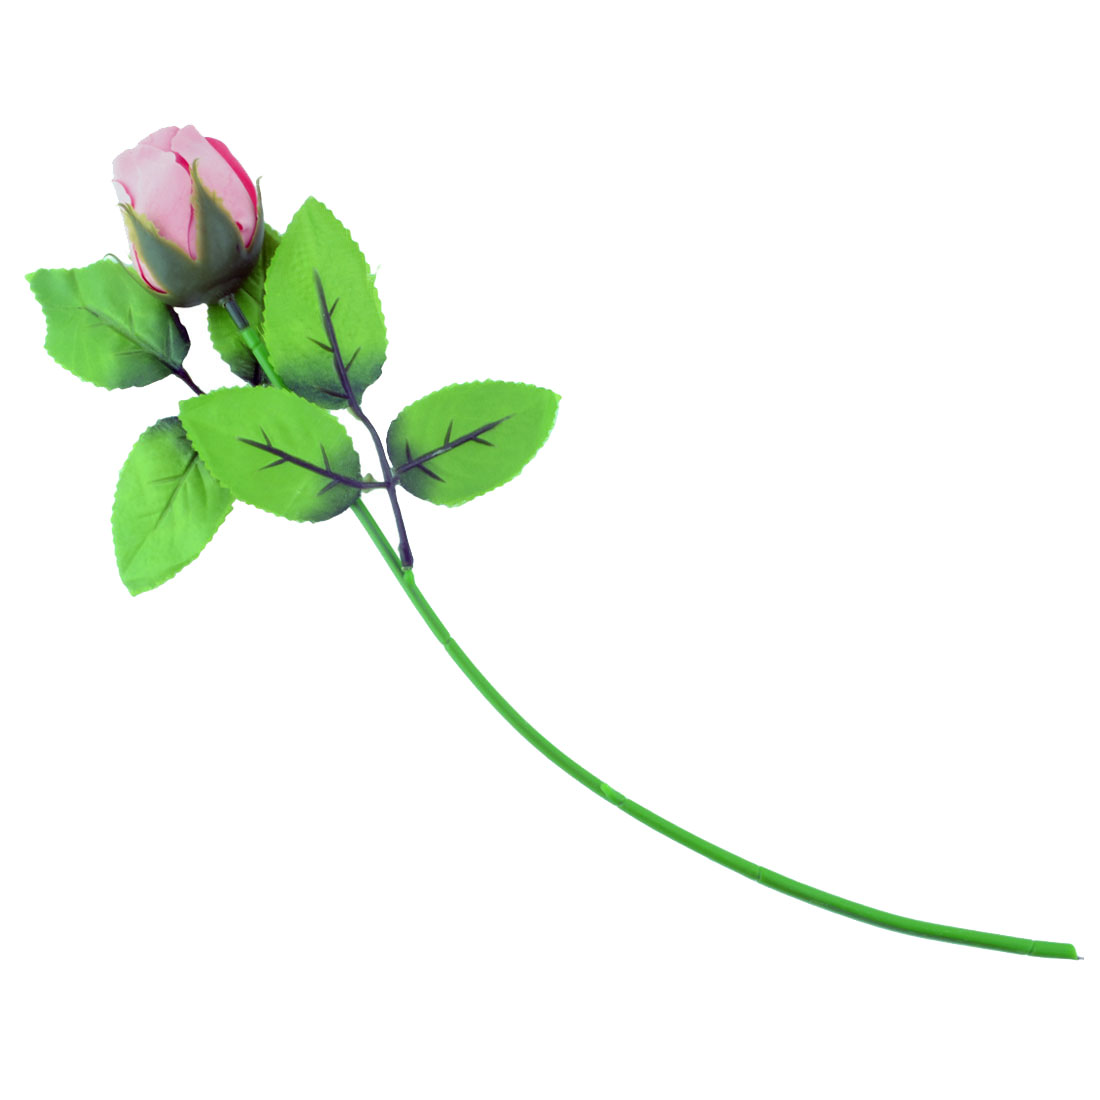 Wedding Party Festival Plastic Emulational Artificial Rose Flower Bud Bouquet Decor